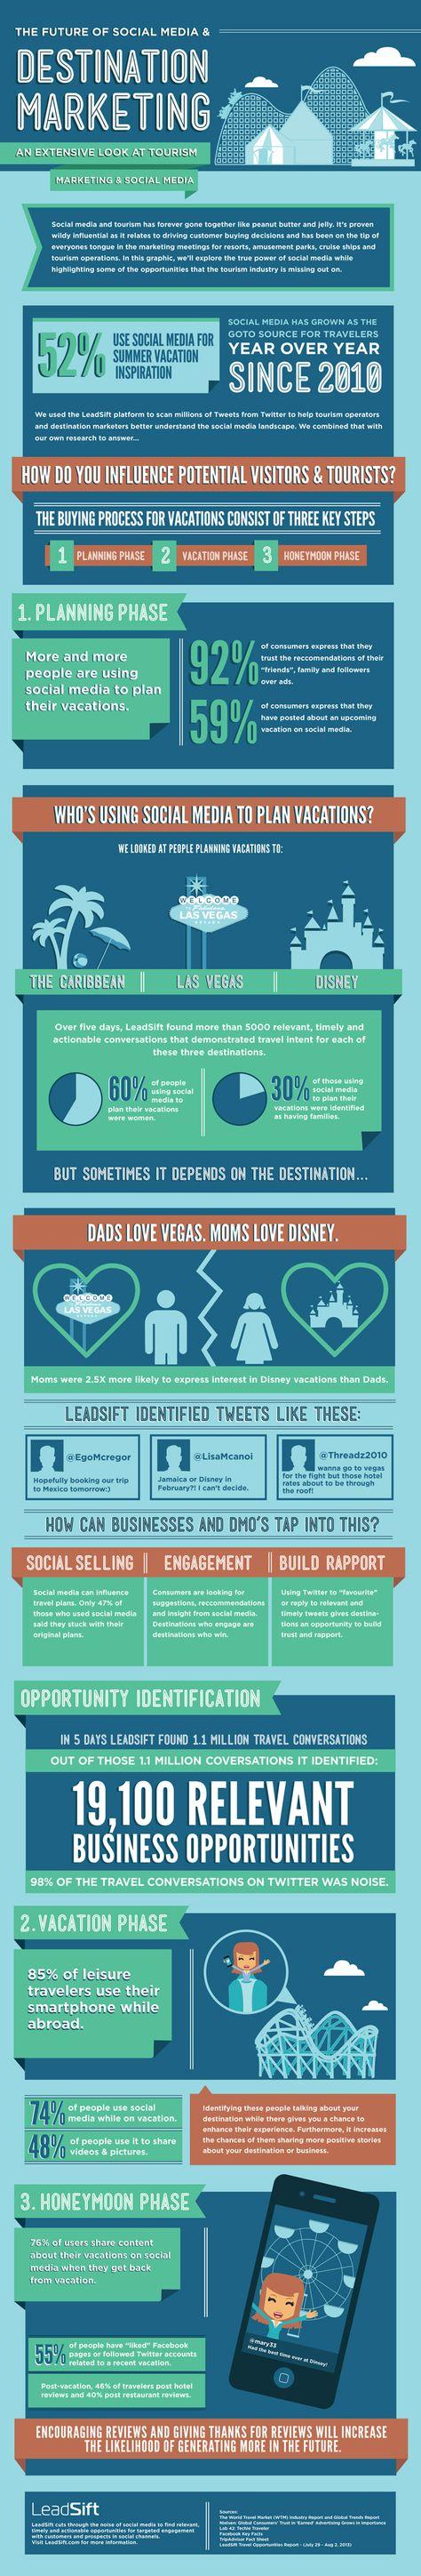 The Future of Social Media & Destination Marketing [INFOGRAPHIC] | LeadSift